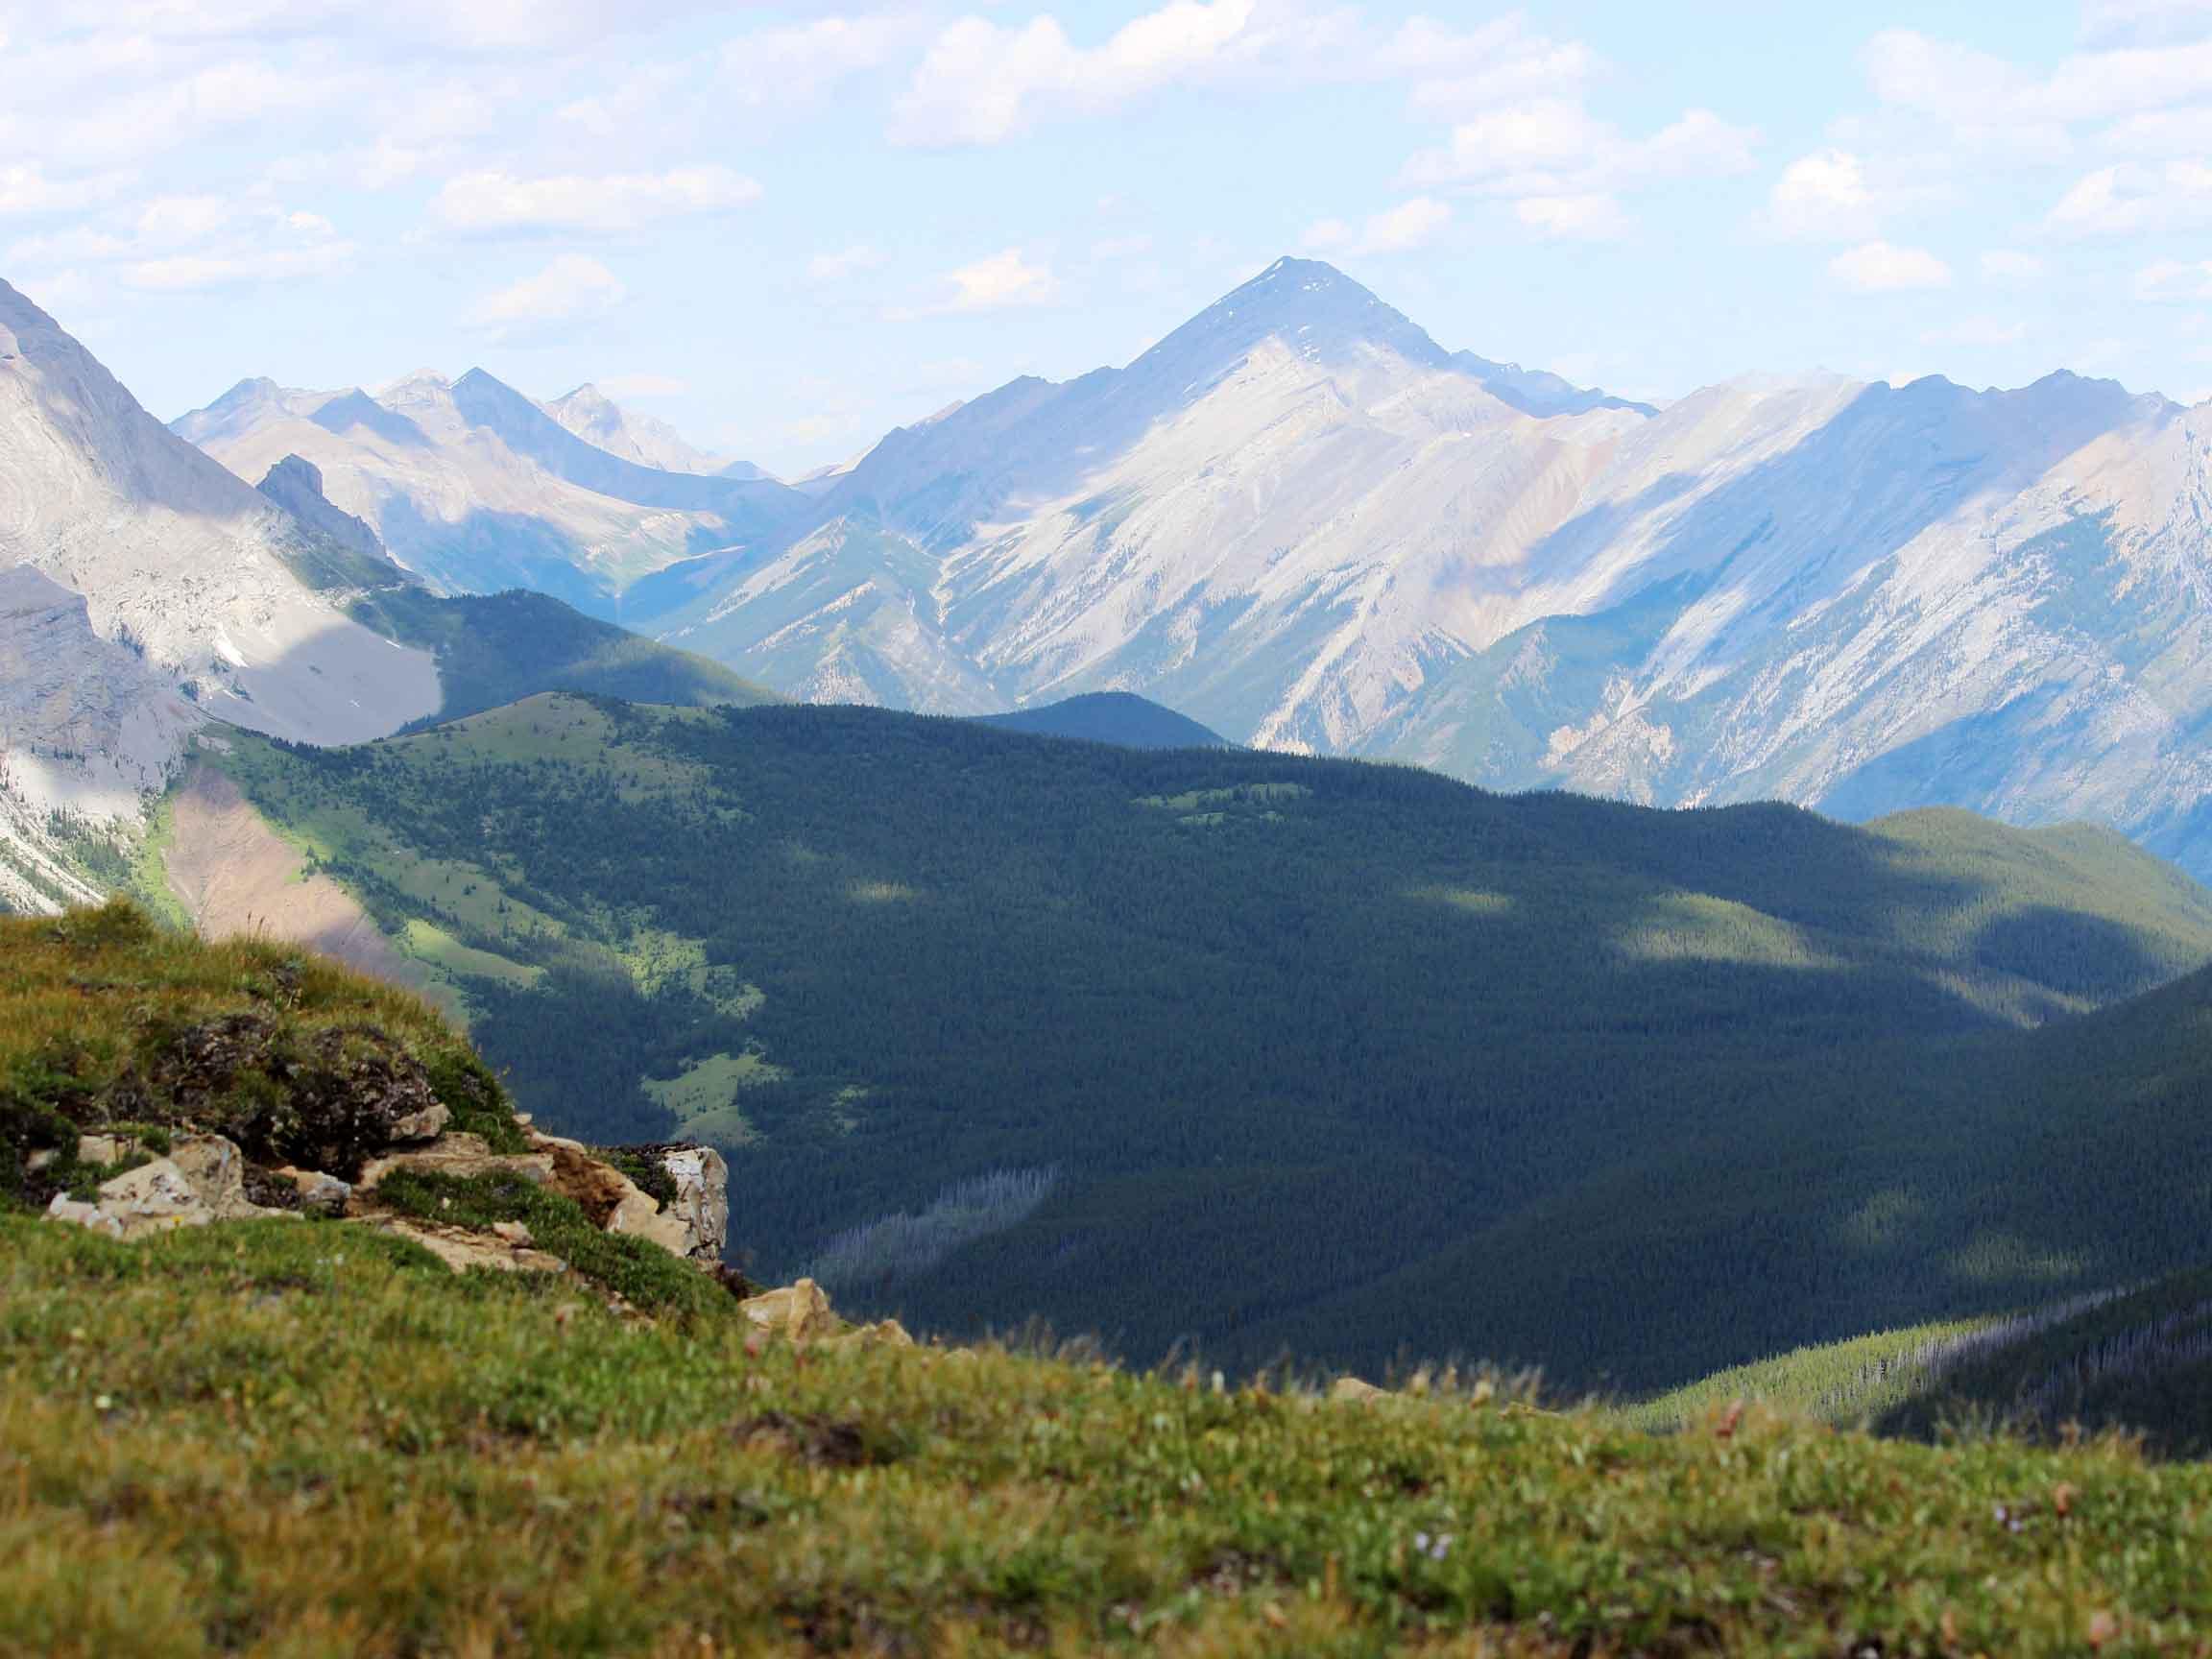 White Mountain Adventures Heli Hike overlooking Banff National Park